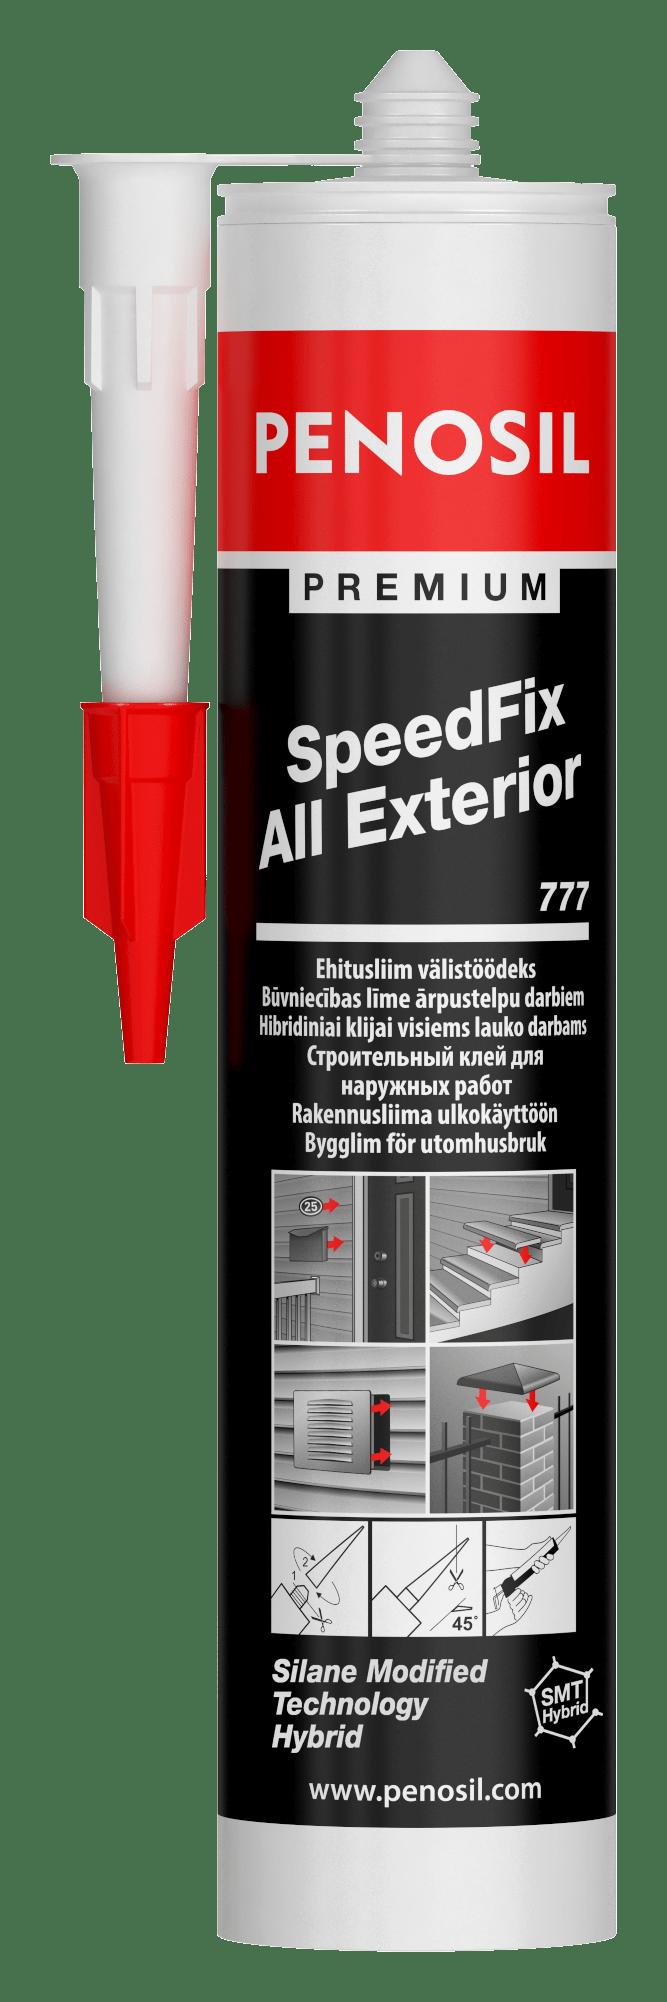 Penosil Premium SpeedFix All Exterior 777 klijai lauko darbams